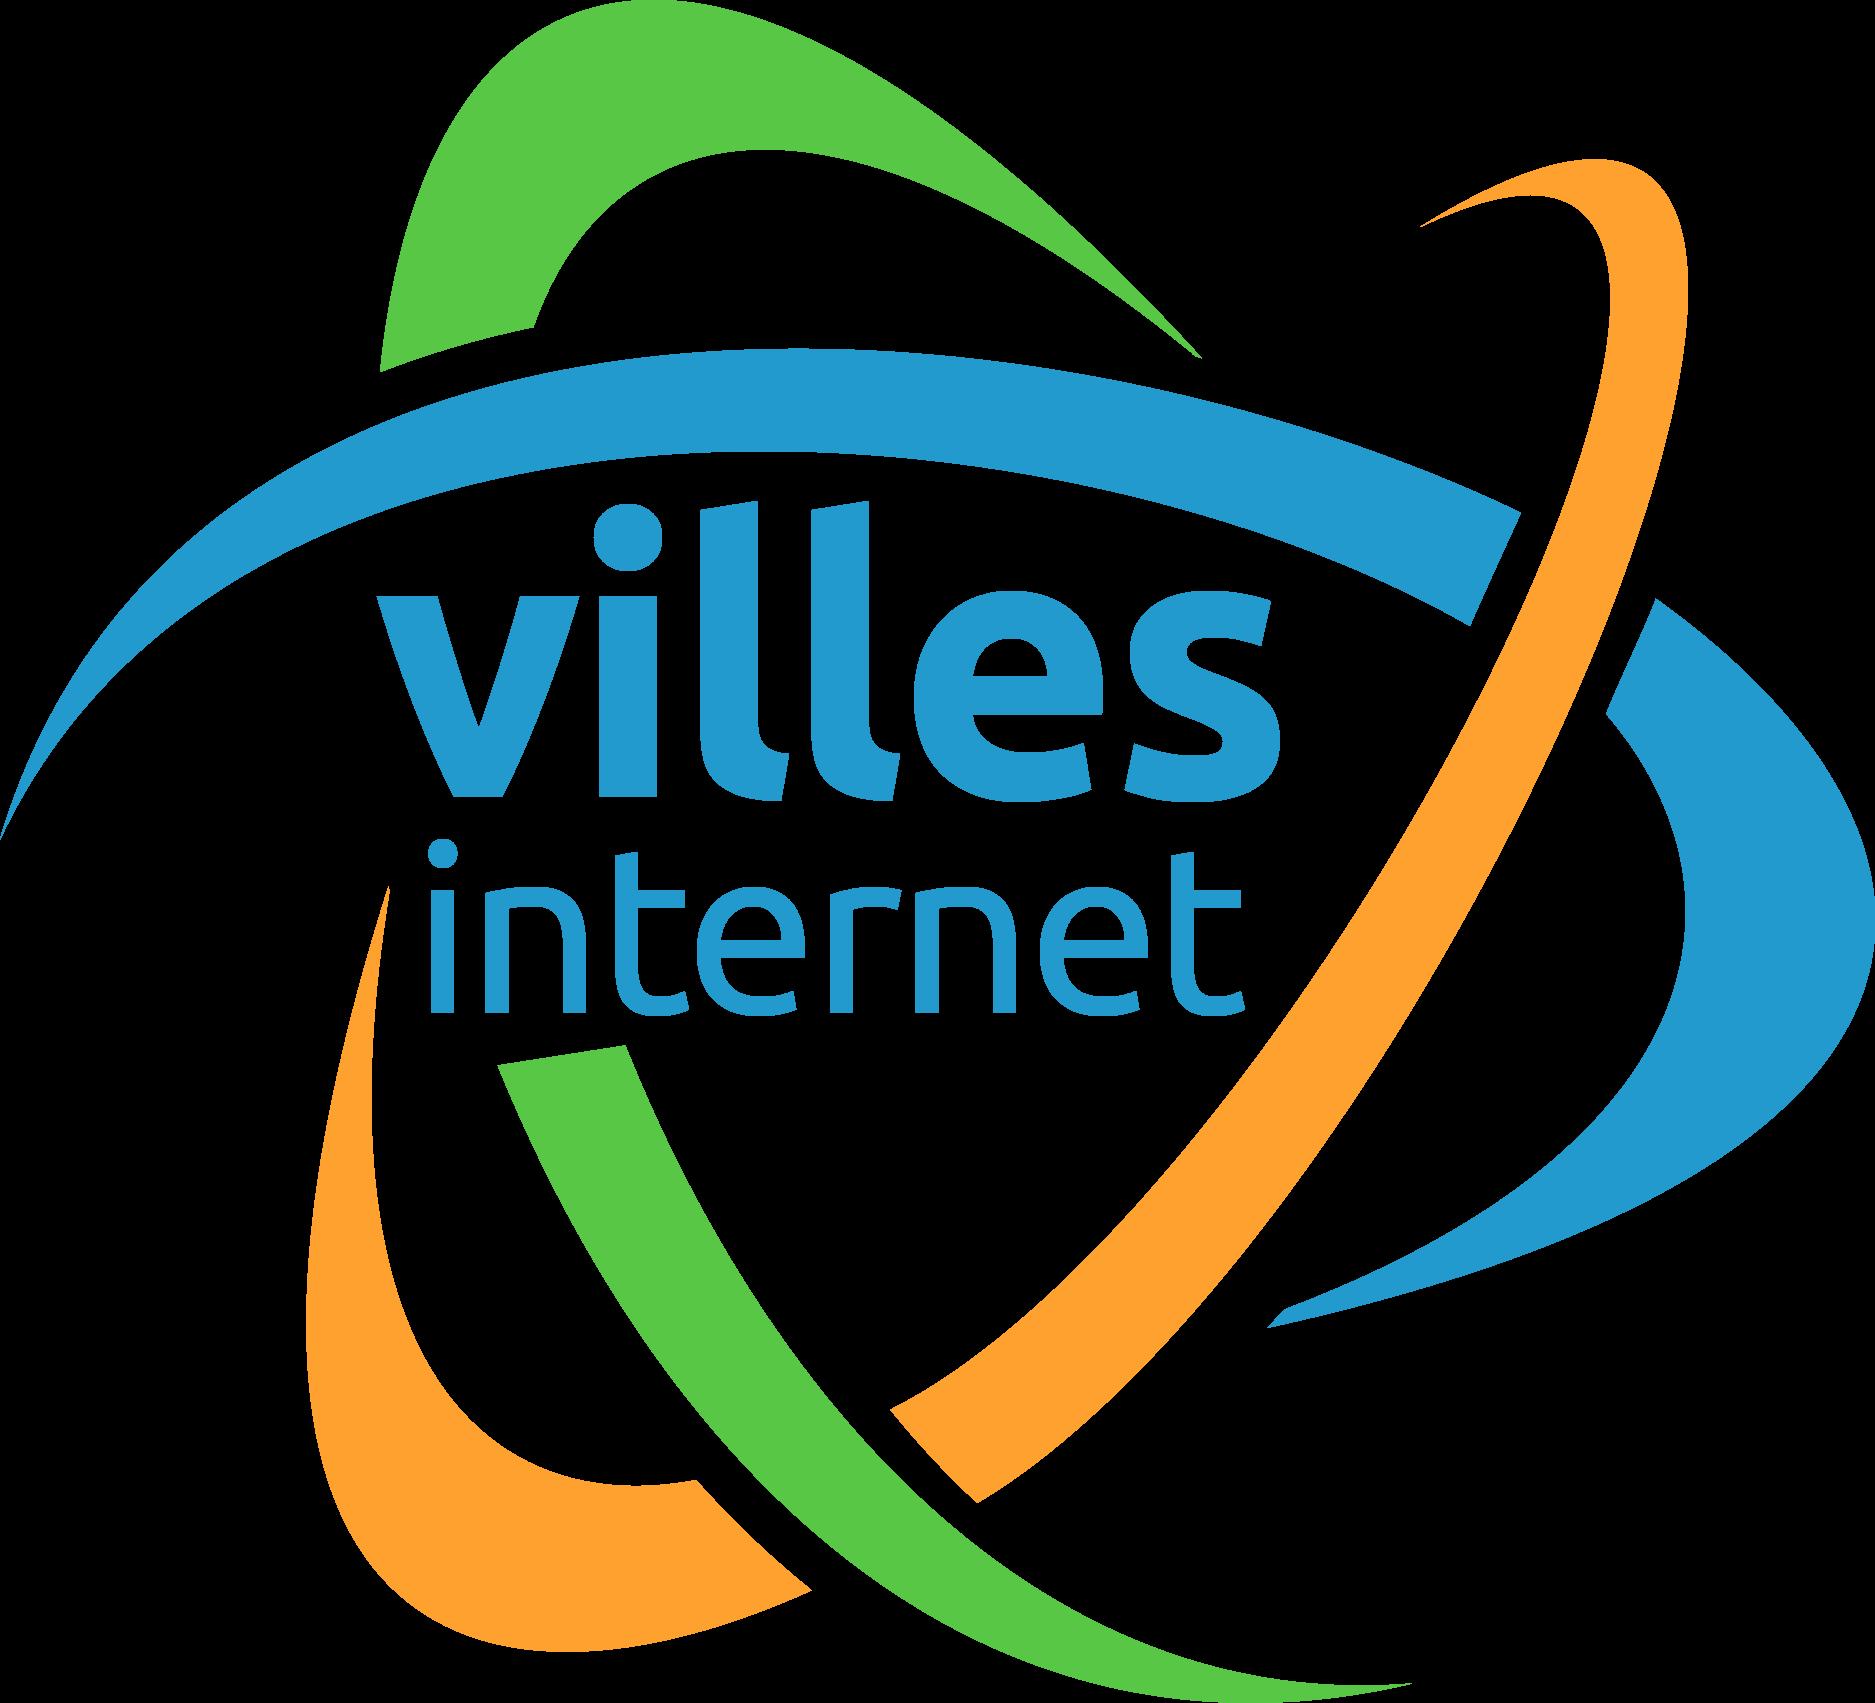 (c) Villes-internet.net